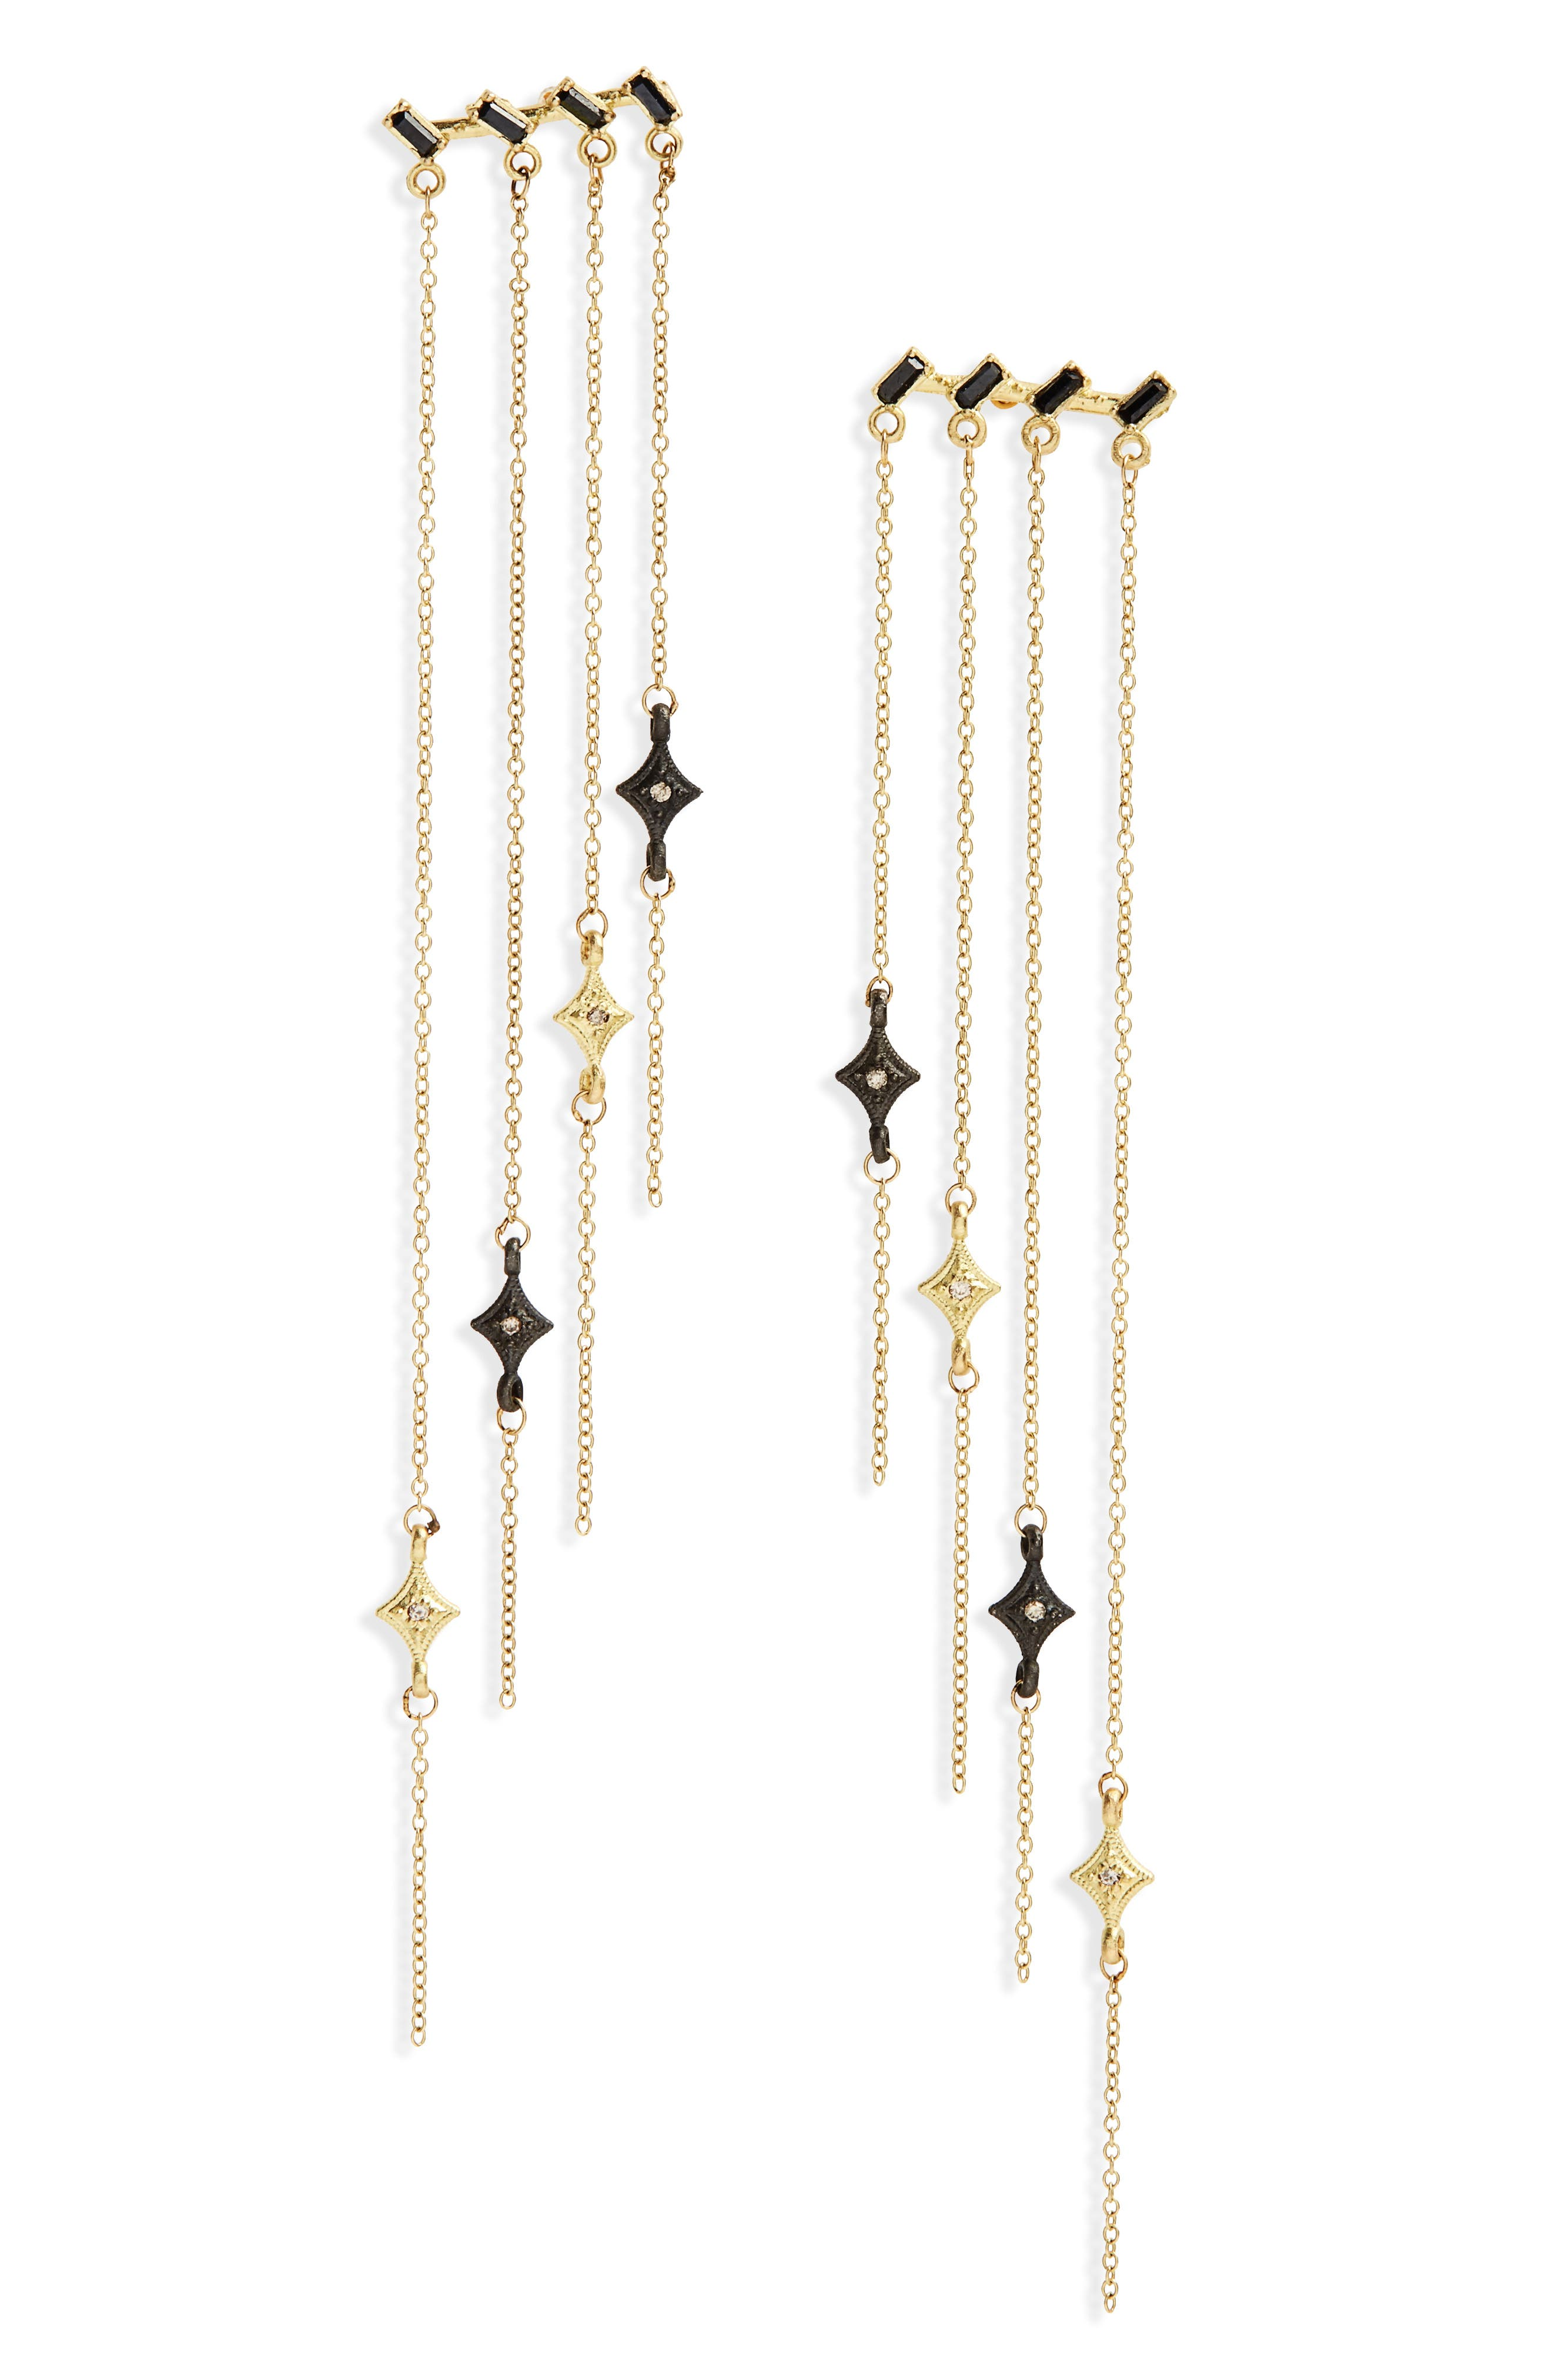 Old World Sapphire & Diamond Chandelier Earrings,                         Main,                         color, GOLD